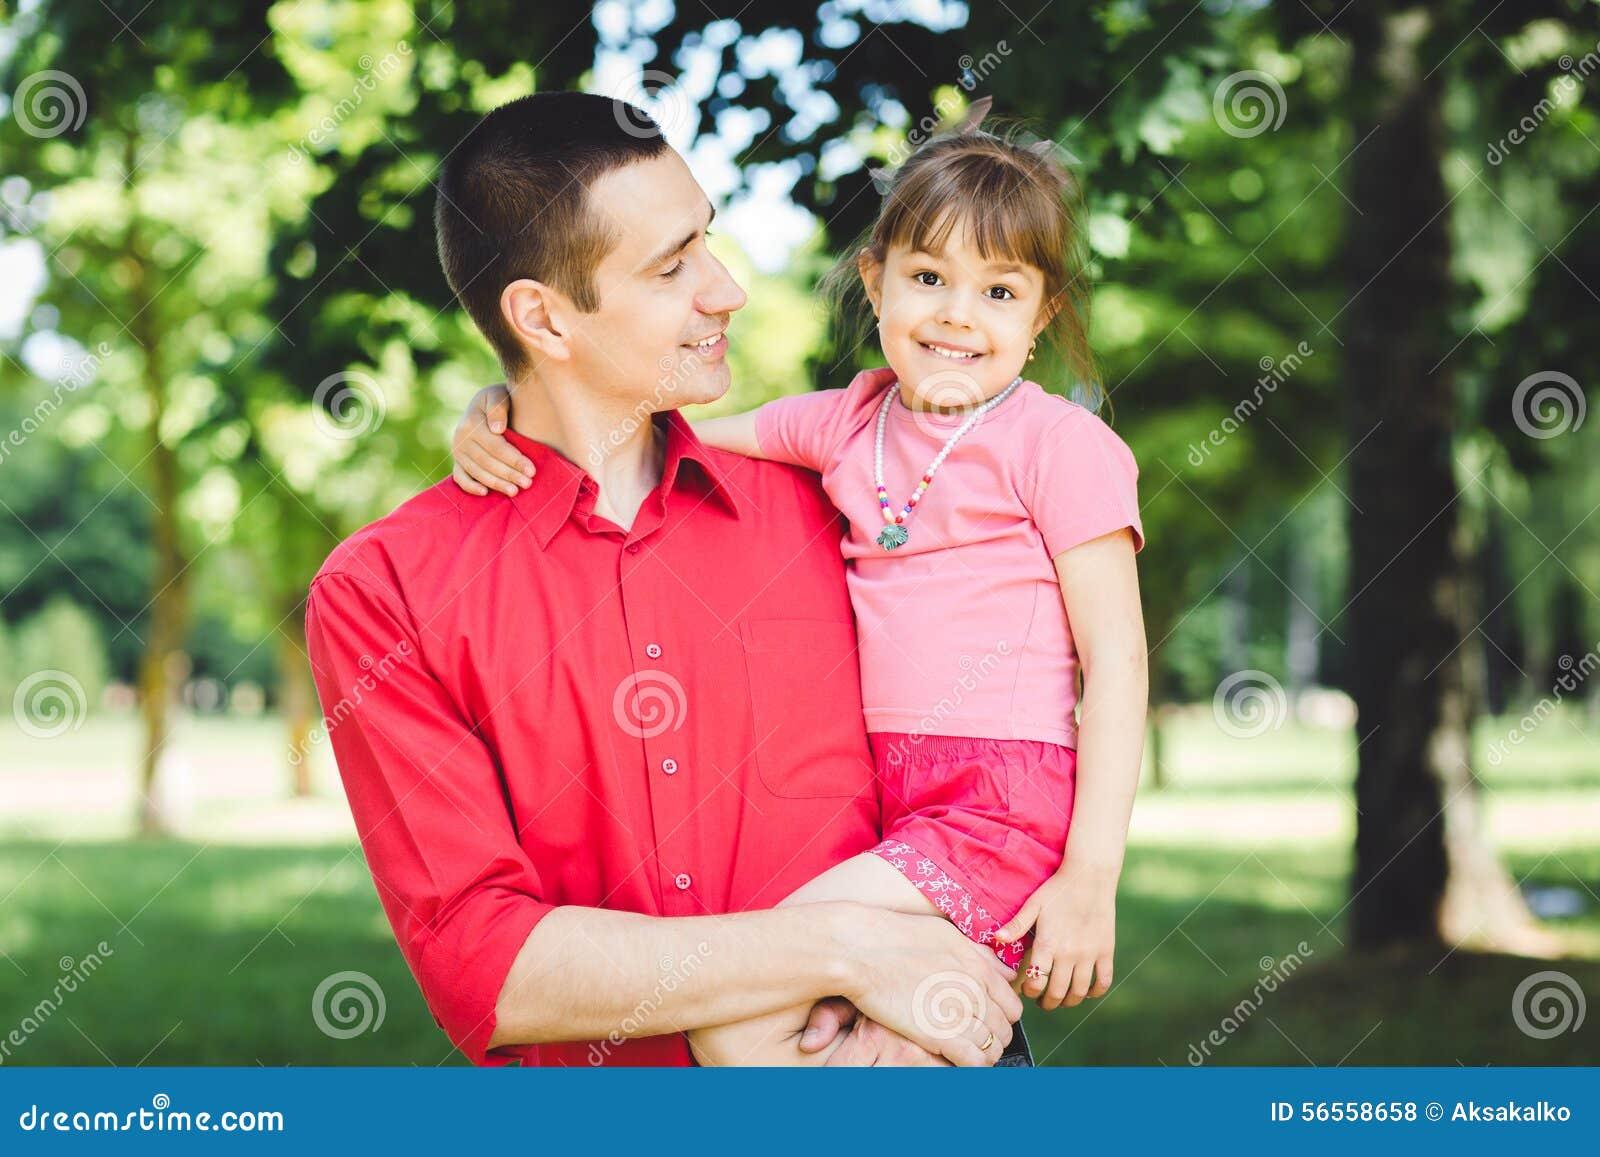 Download Πατέρας και κόρη στοκ εικόνες. εικόνα από lifestyle, άτομα - 56558658